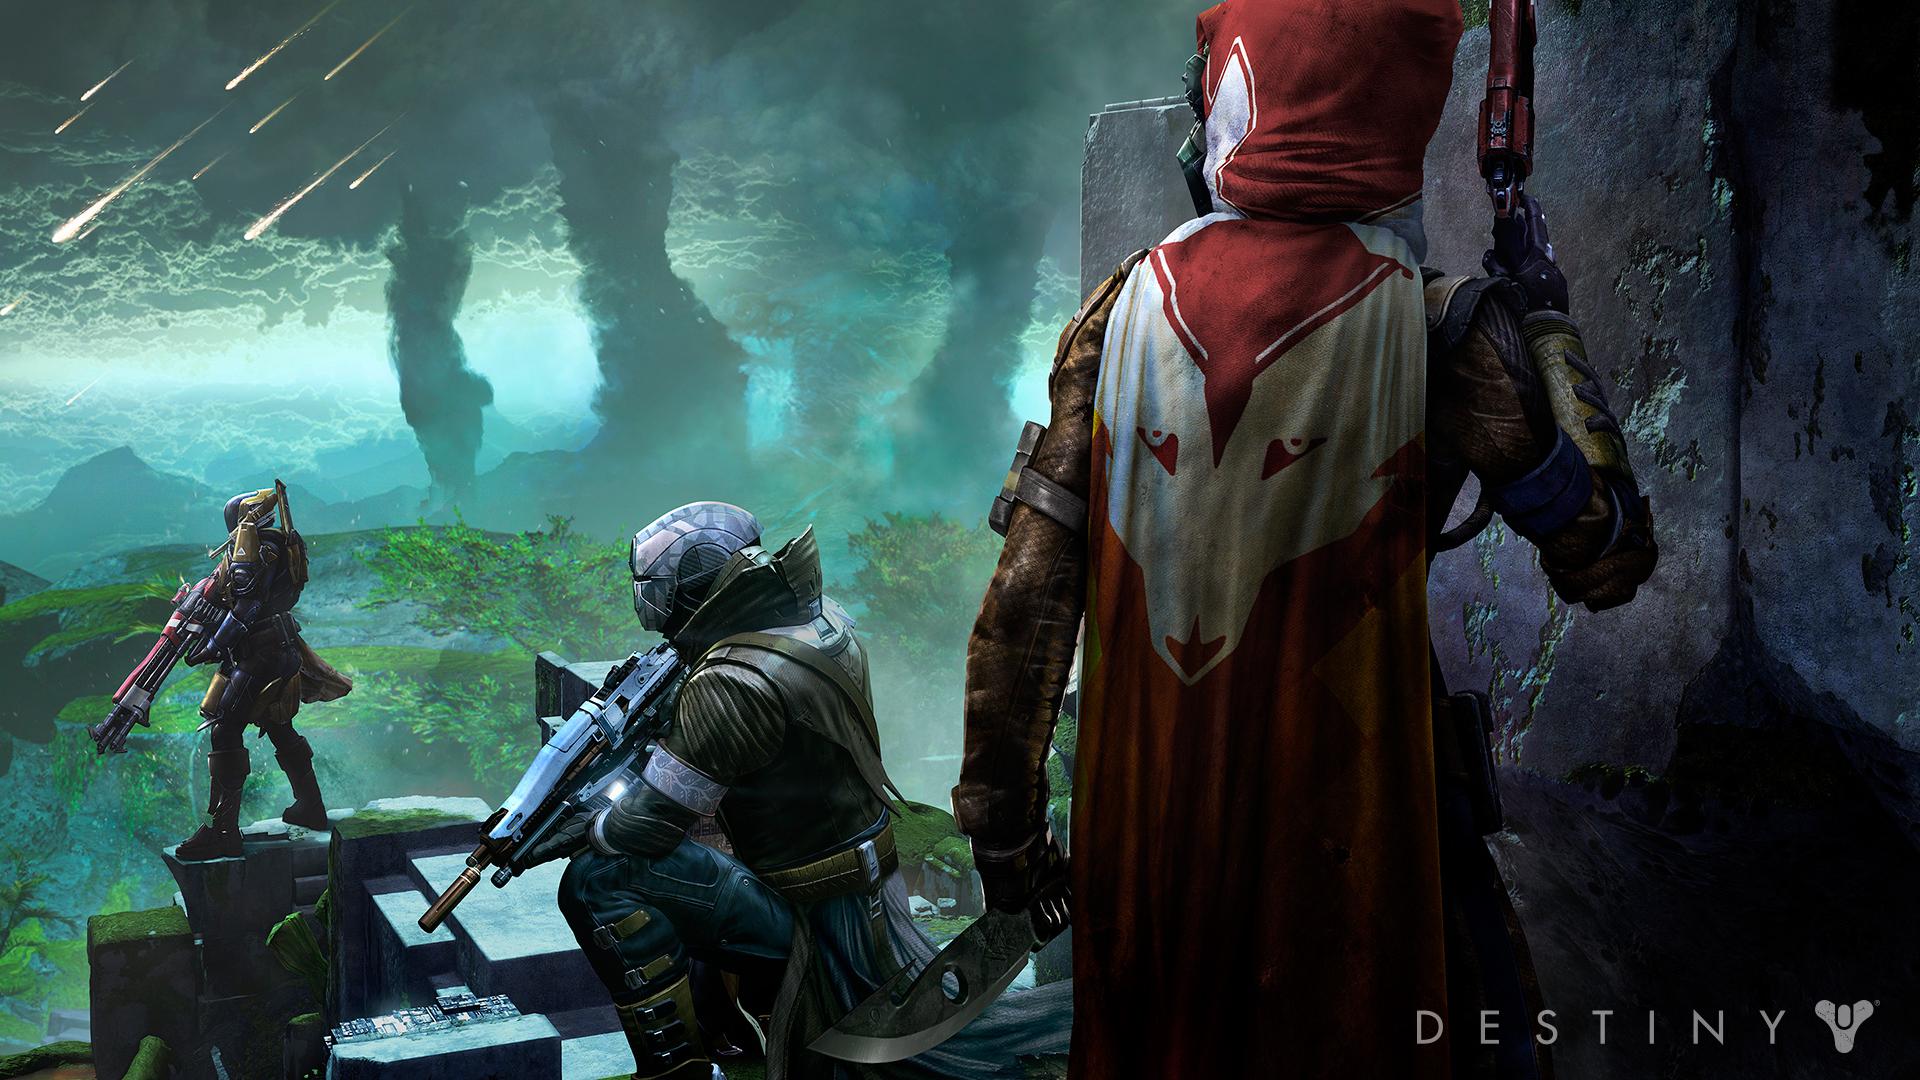 Destiny 2 Full Hd 2383411 Hd Wallpaper Backgrounds Download